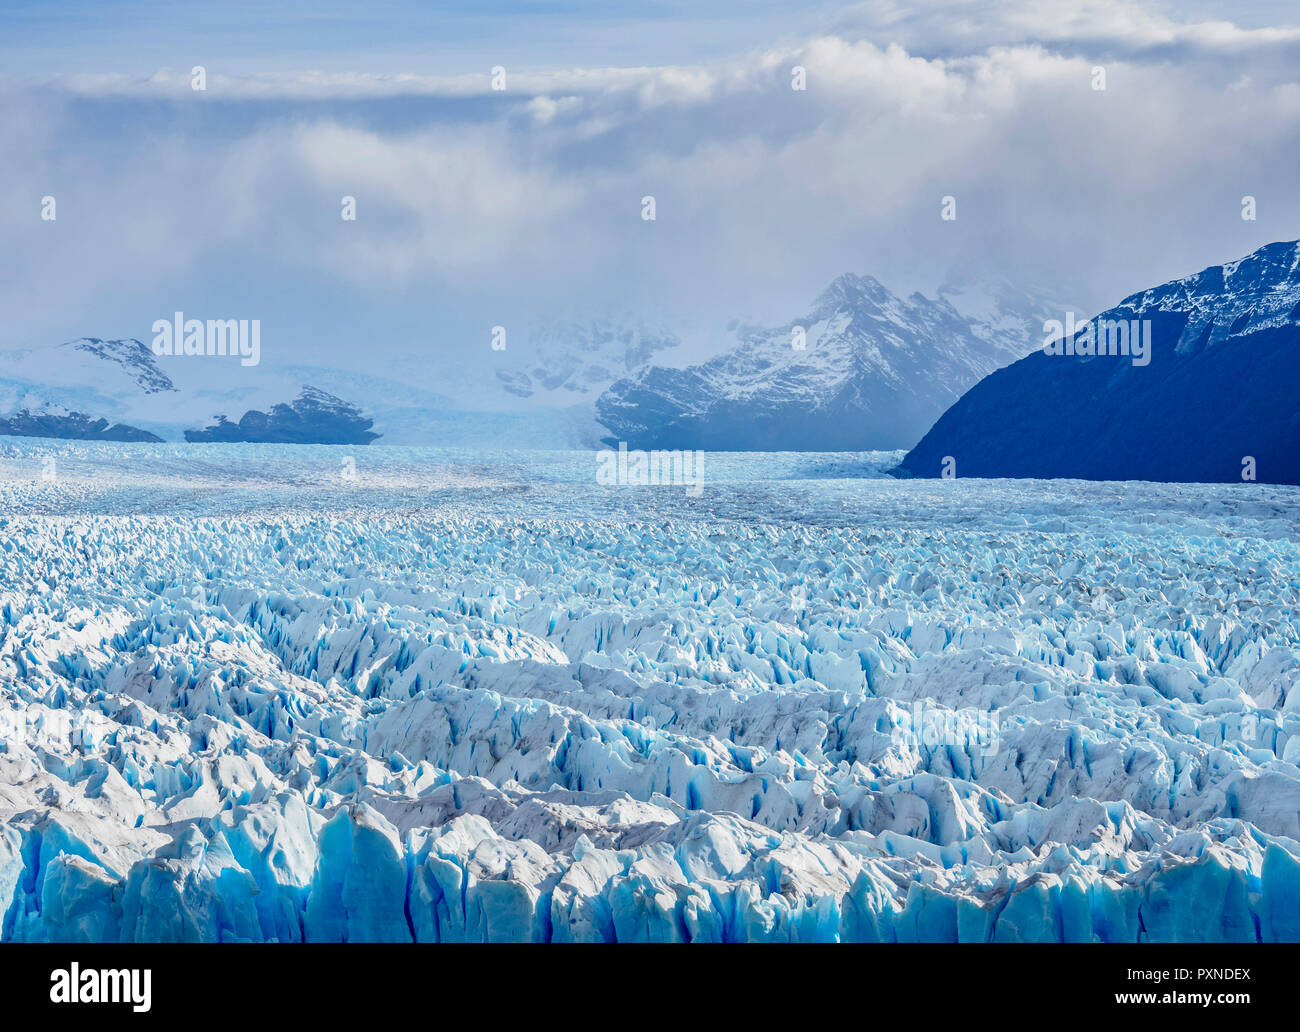 Perito Moreno Glacier, elevated view, Los Glaciares National Park, Santa Cruz Province, Patagonia, Argentina Stock Photo